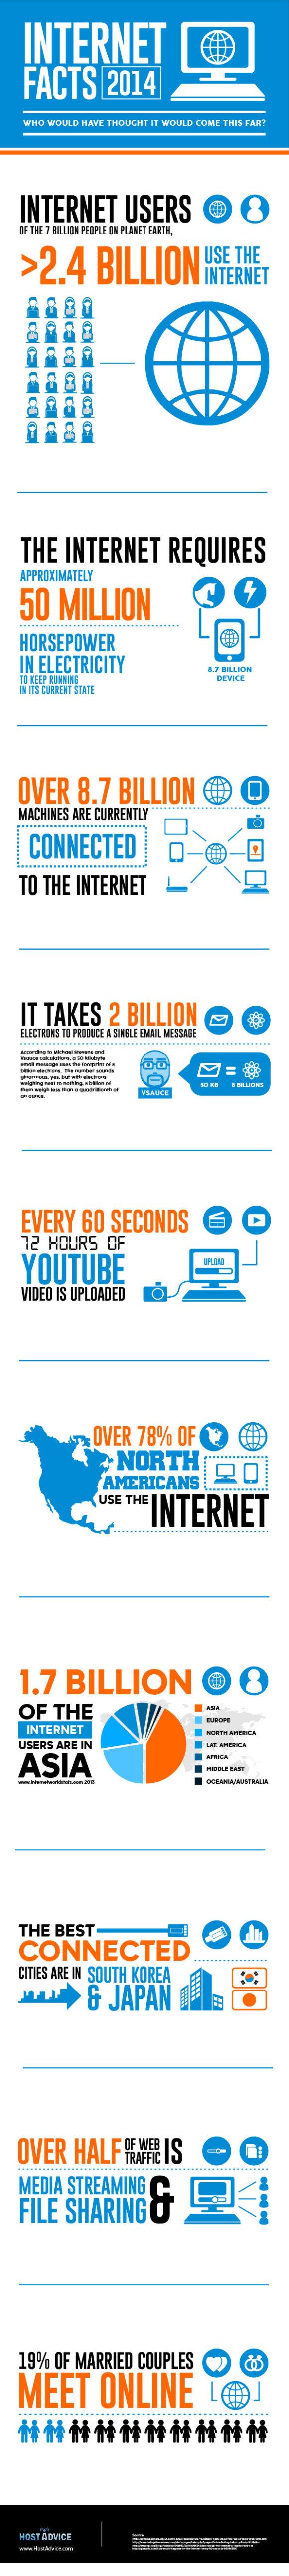 Internet-Factsjpg